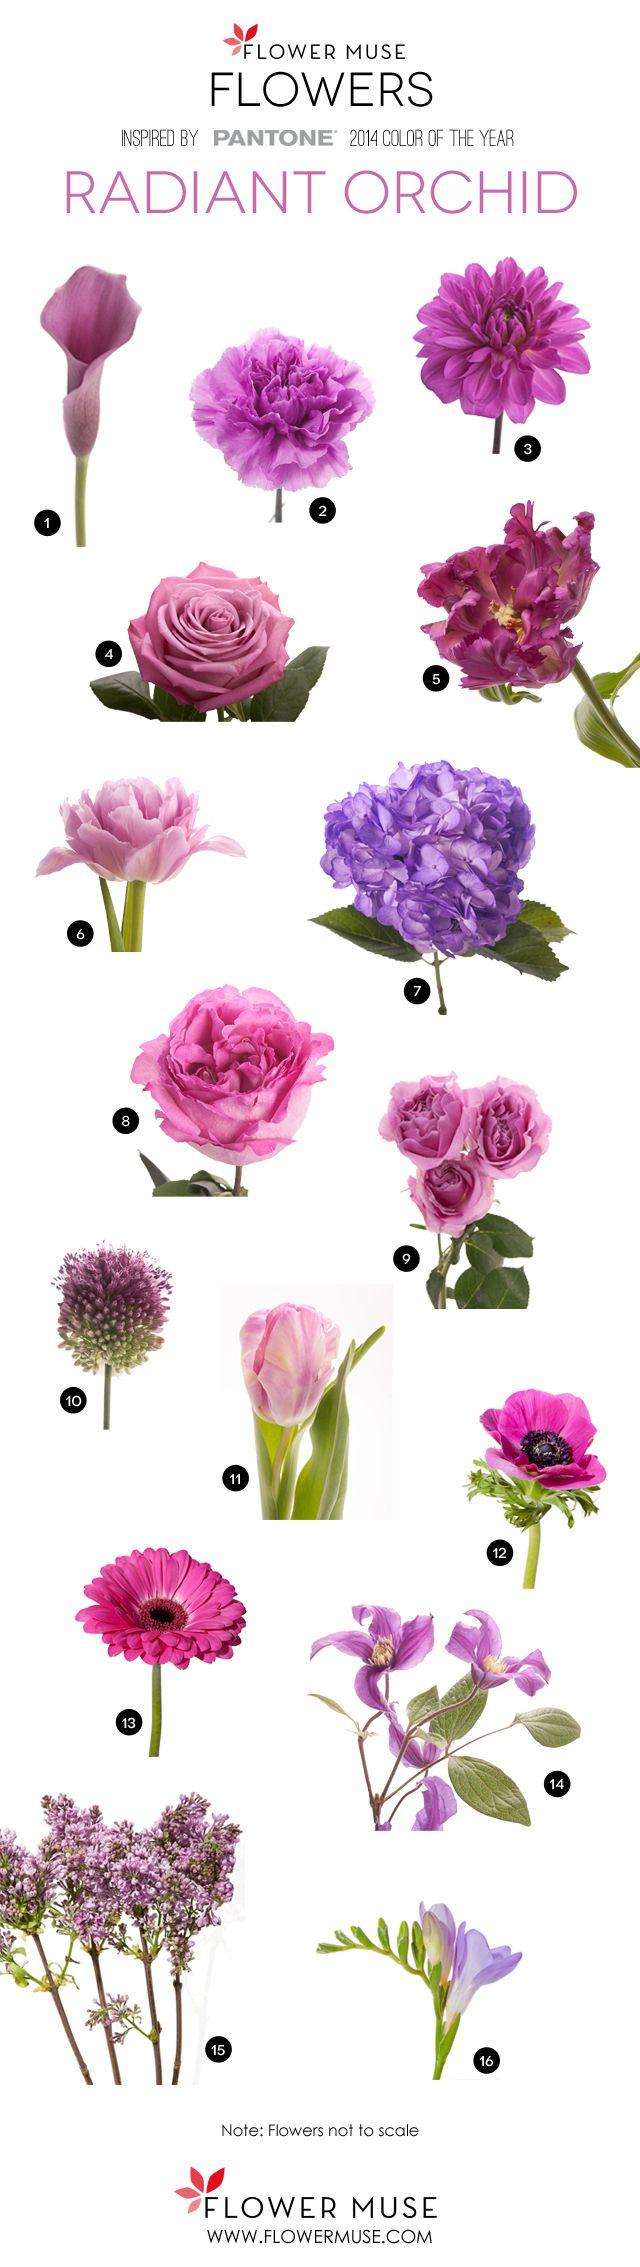 16 Variedades de flores de color Orquídea Radiante para bodas 2014. #FloresDeBodas